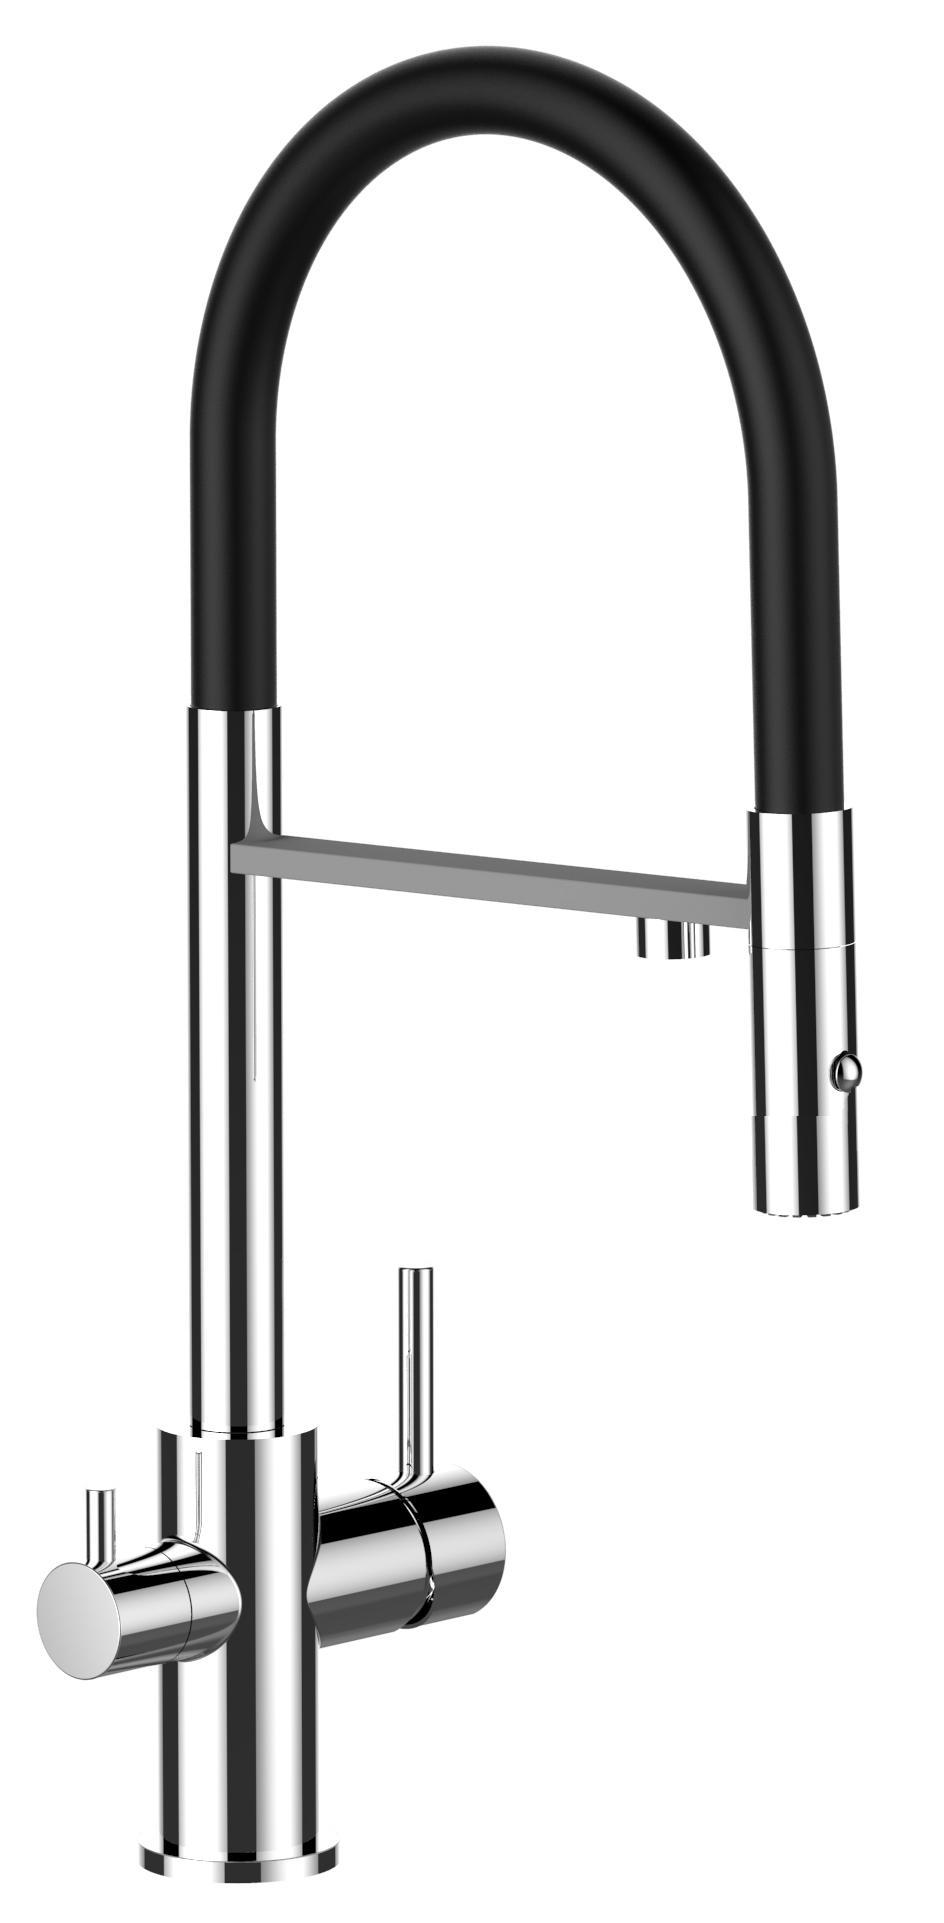 k chenarmatur umkehr osmose filter trinkwasser trinkwasserfilter 3 wege k chenmischer. Black Bedroom Furniture Sets. Home Design Ideas